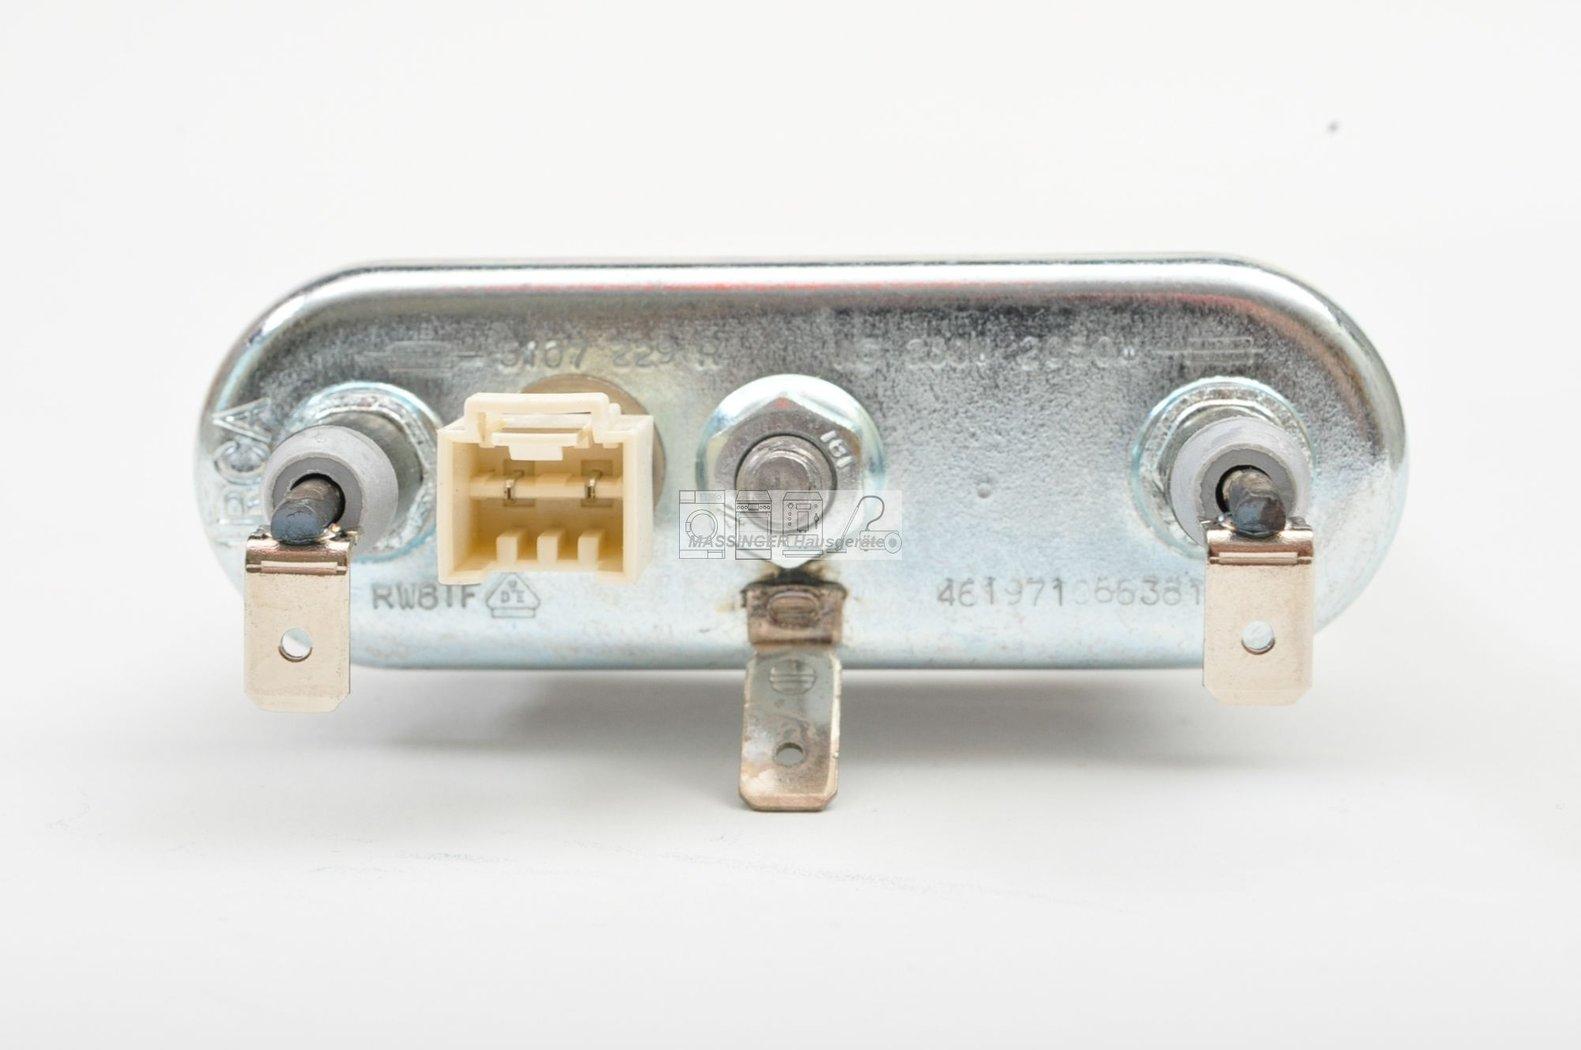 bauknecht heizstab whirlpool heizung ignis waschmaschine. Black Bedroom Furniture Sets. Home Design Ideas